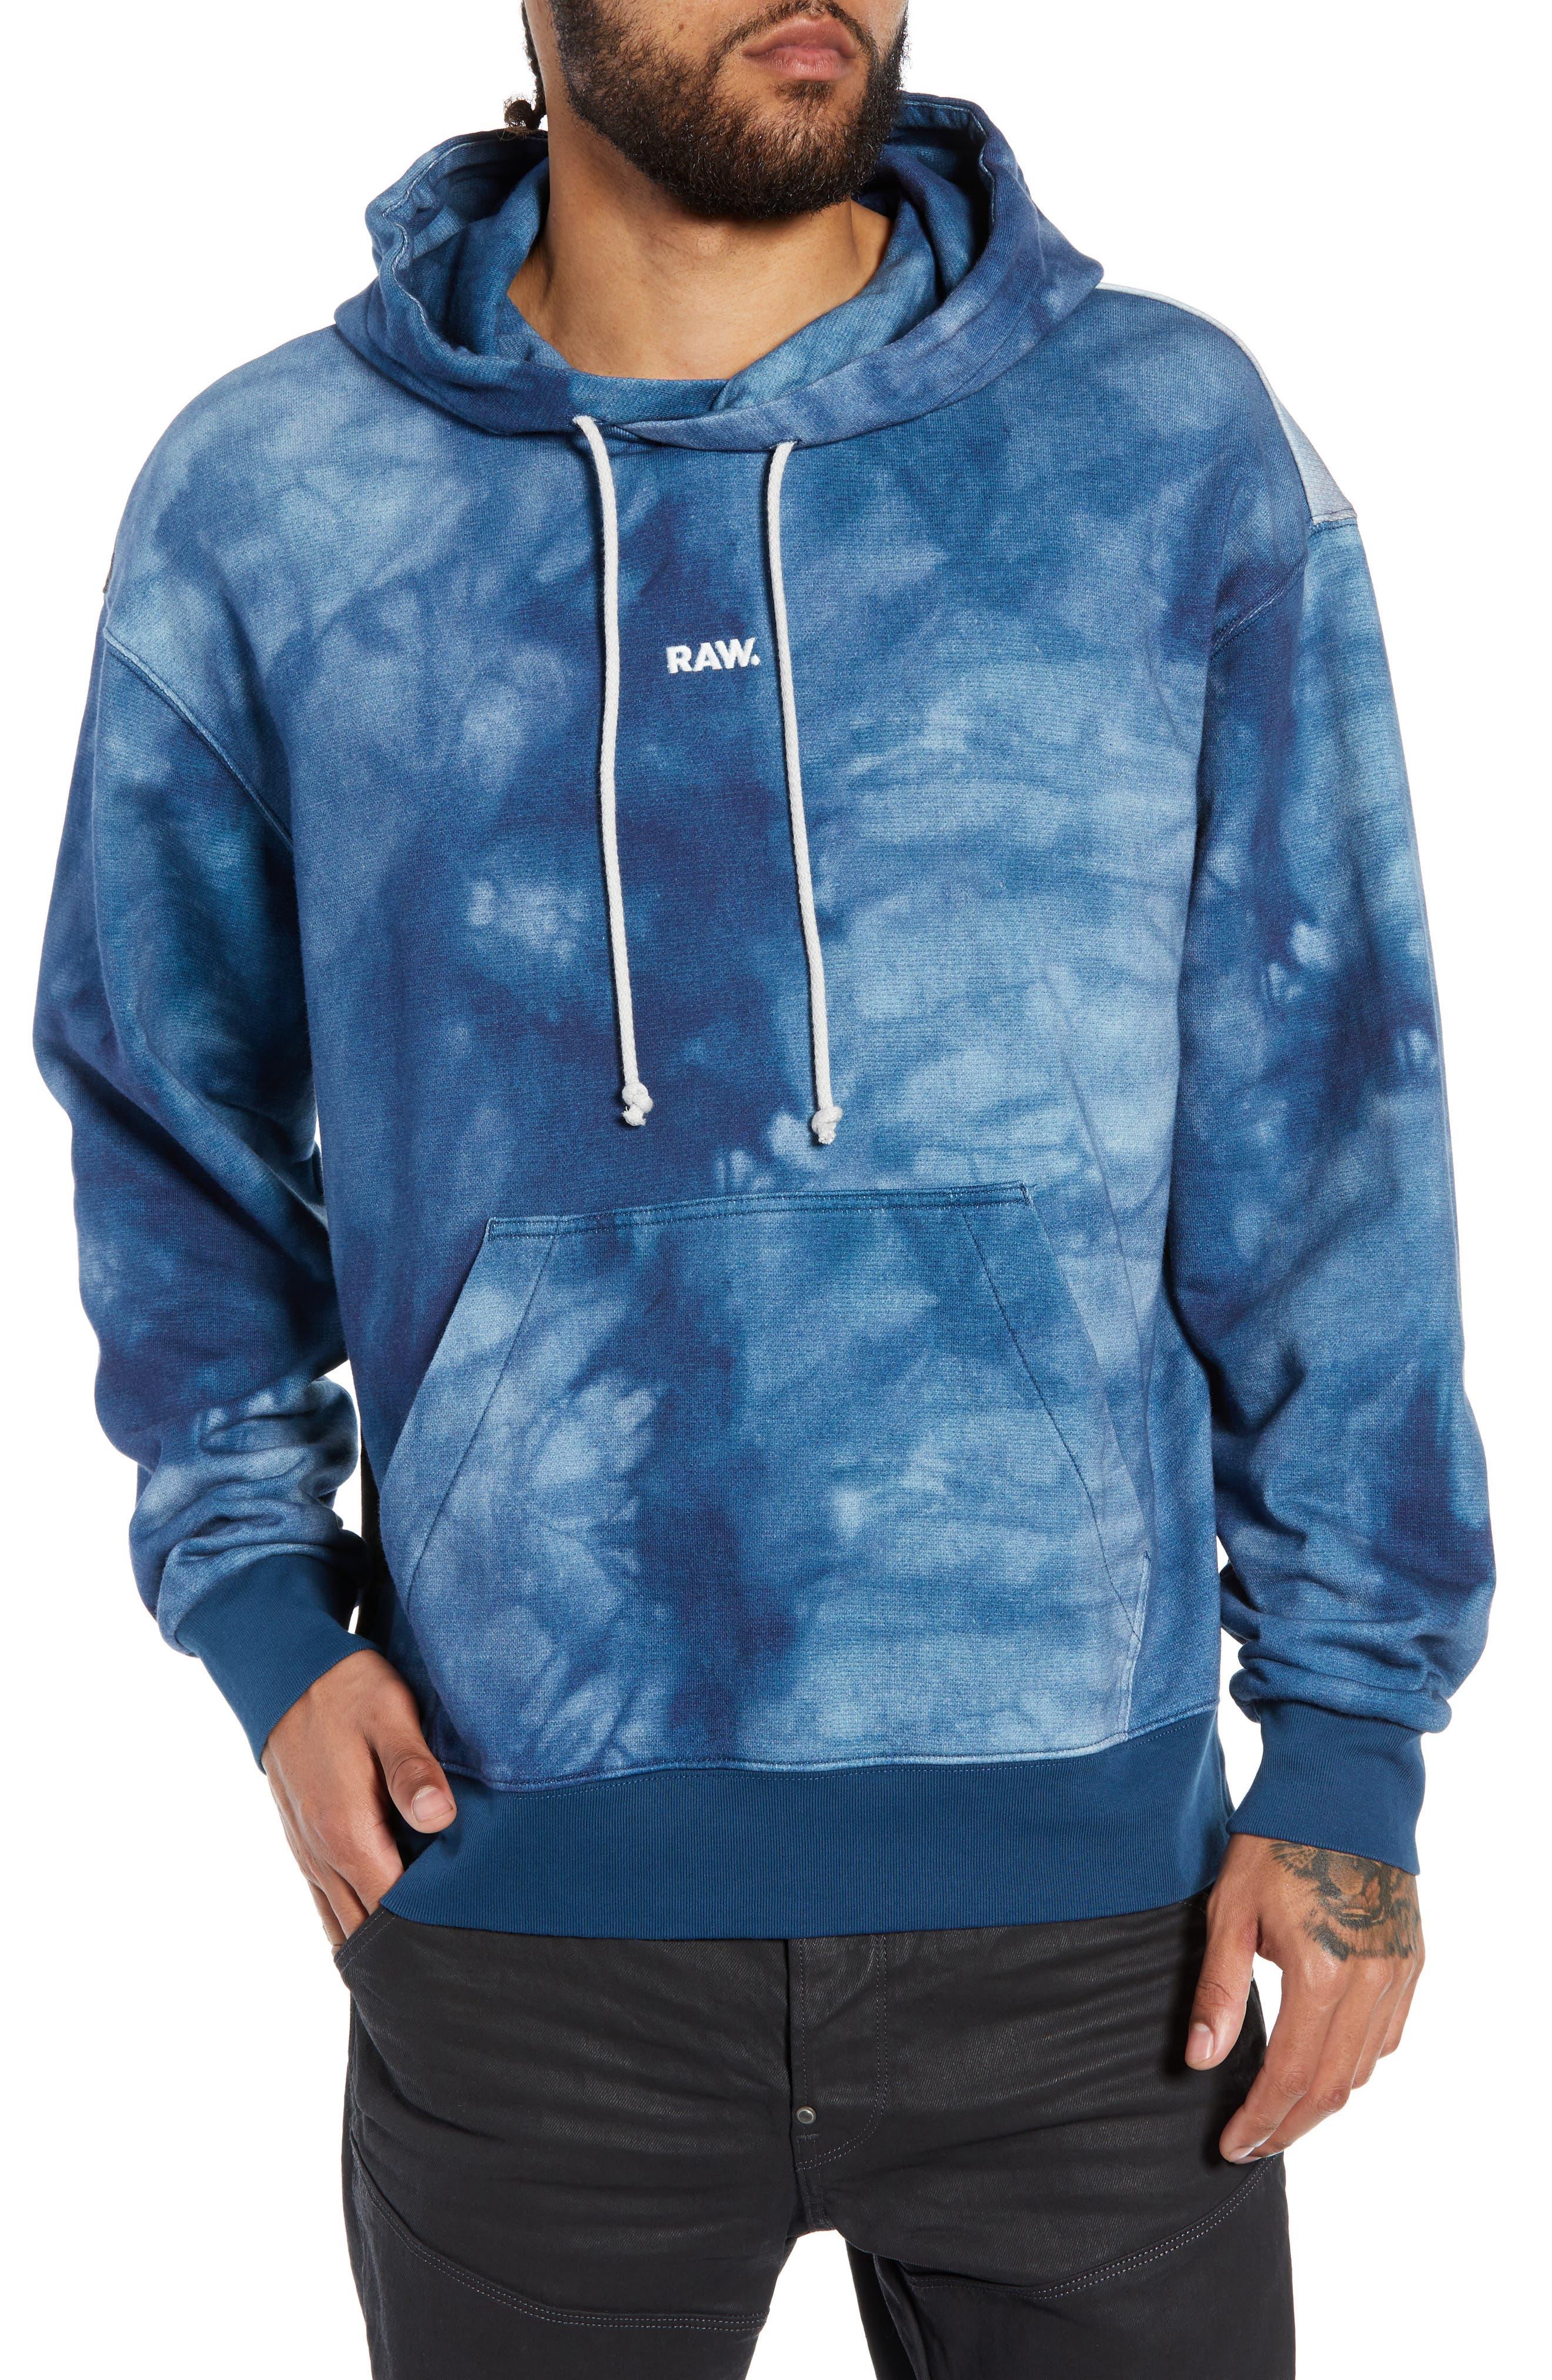 Cryrer Waterfall Hooded Sweatshirt,                             Main thumbnail 1, color,                             TEAL BLUE